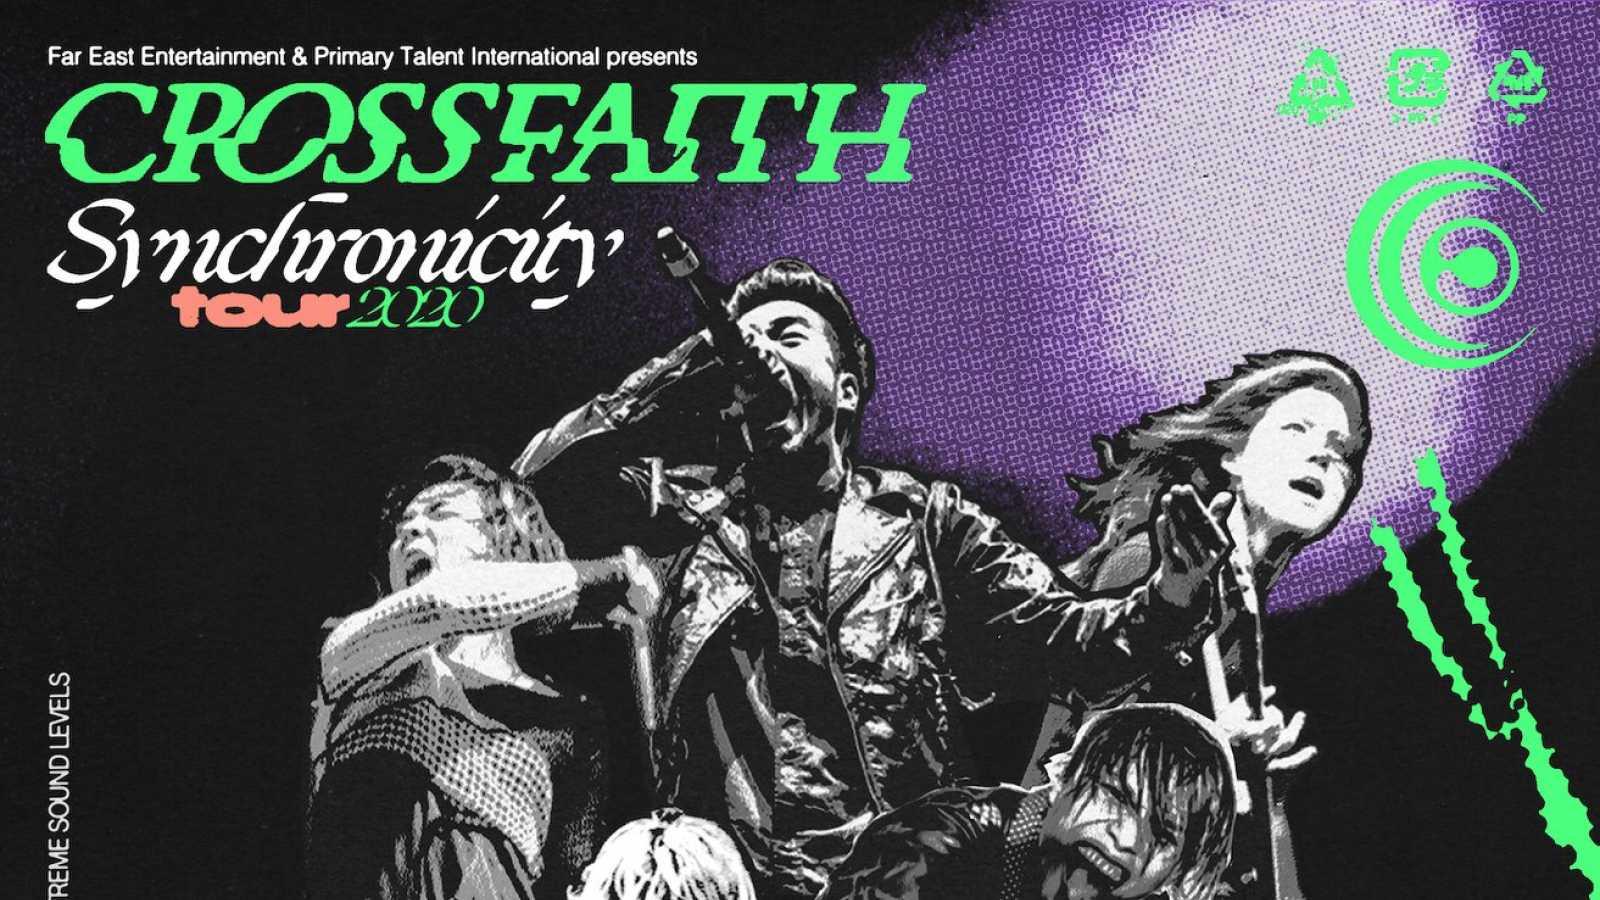 Nouvelle tournée européenne pour CROSSFAITH © All Rights Reserved